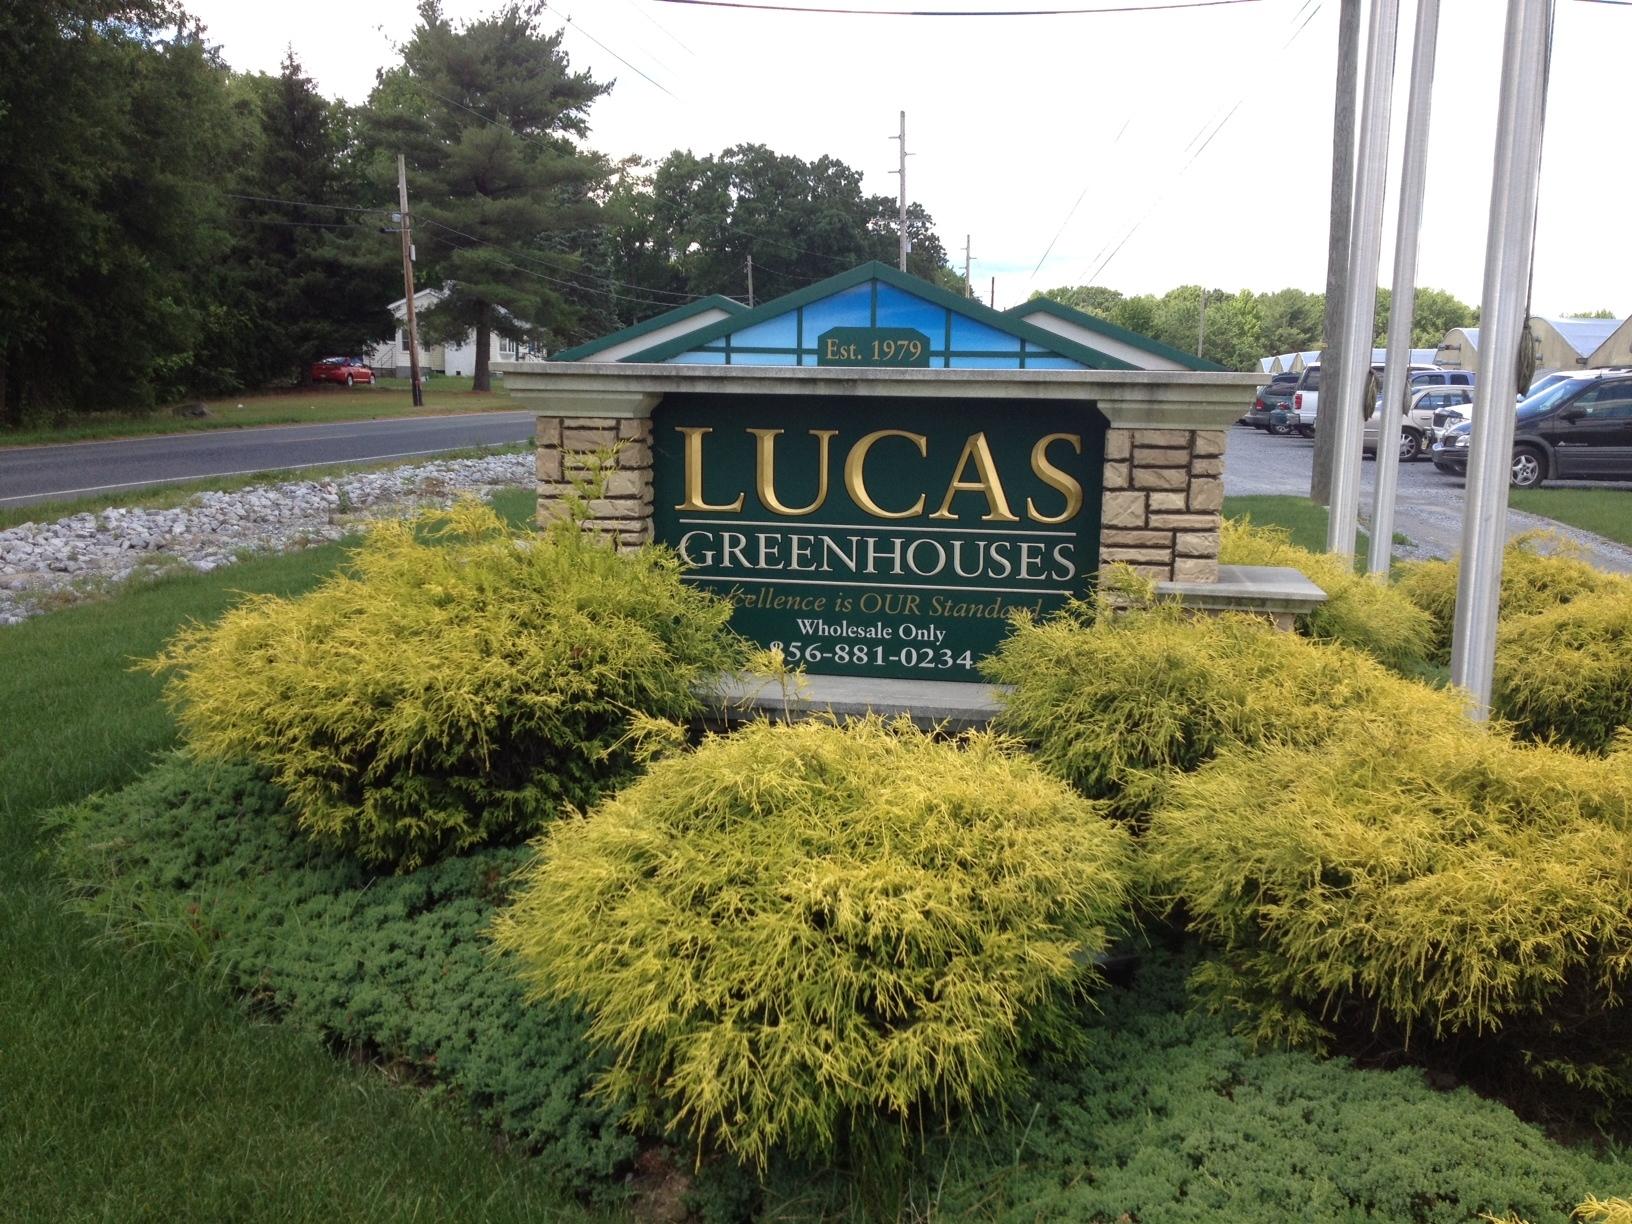 Lucas Greenhouses